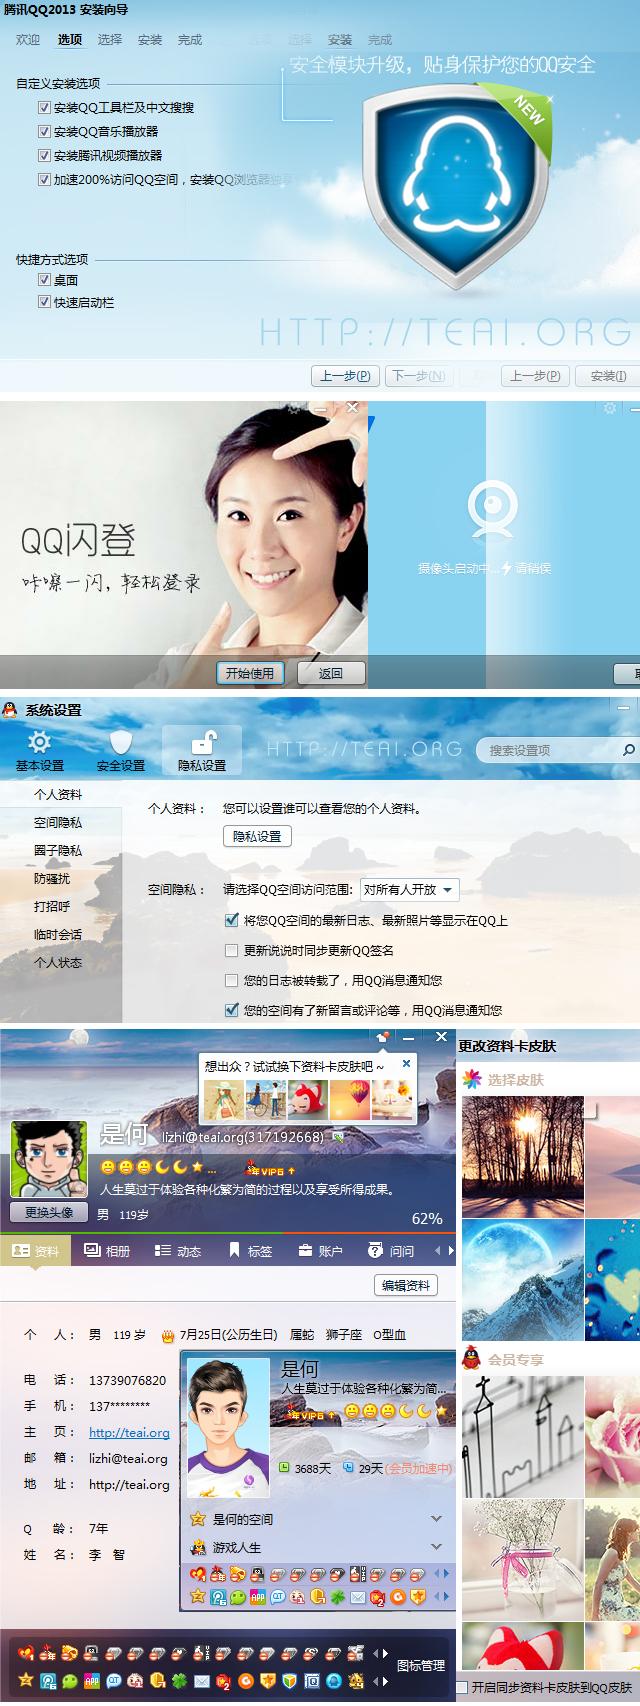 QQ2013公开下载体验版,人脸输密登陆、自定义资料卡背景